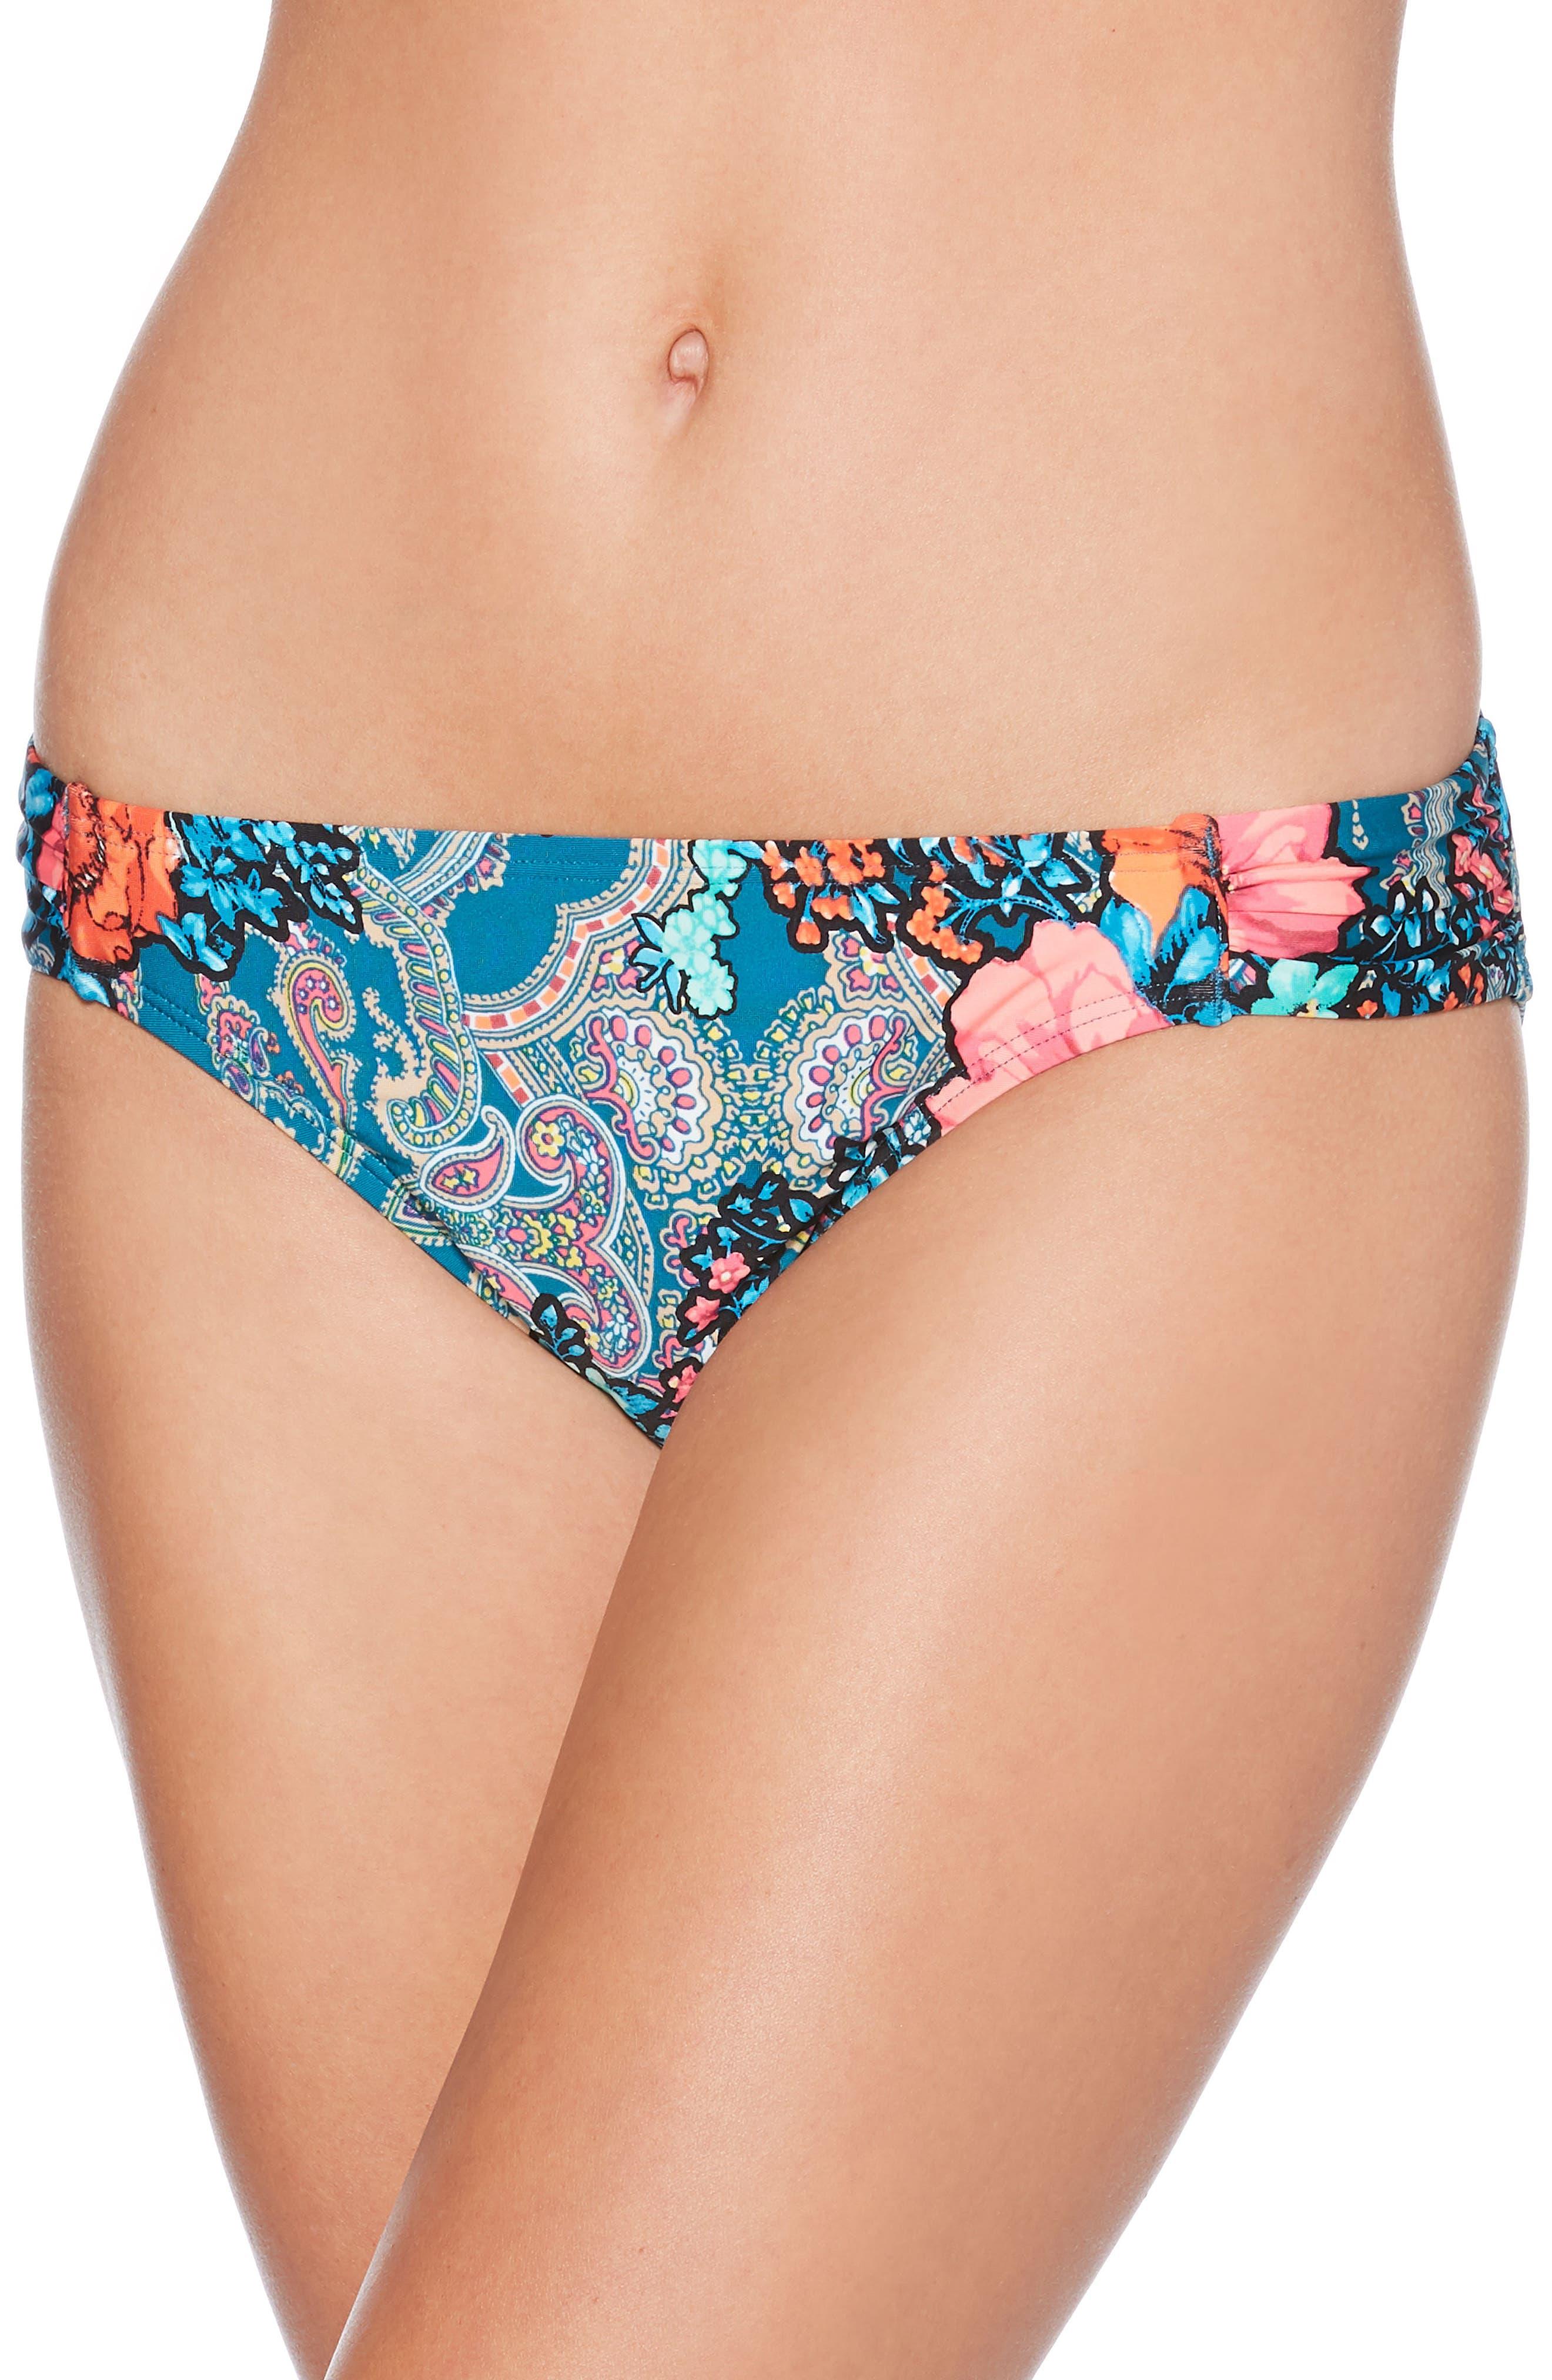 Floral Paisley Hipster Bikini Bottoms,                             Main thumbnail 1, color,                             Deep Teal